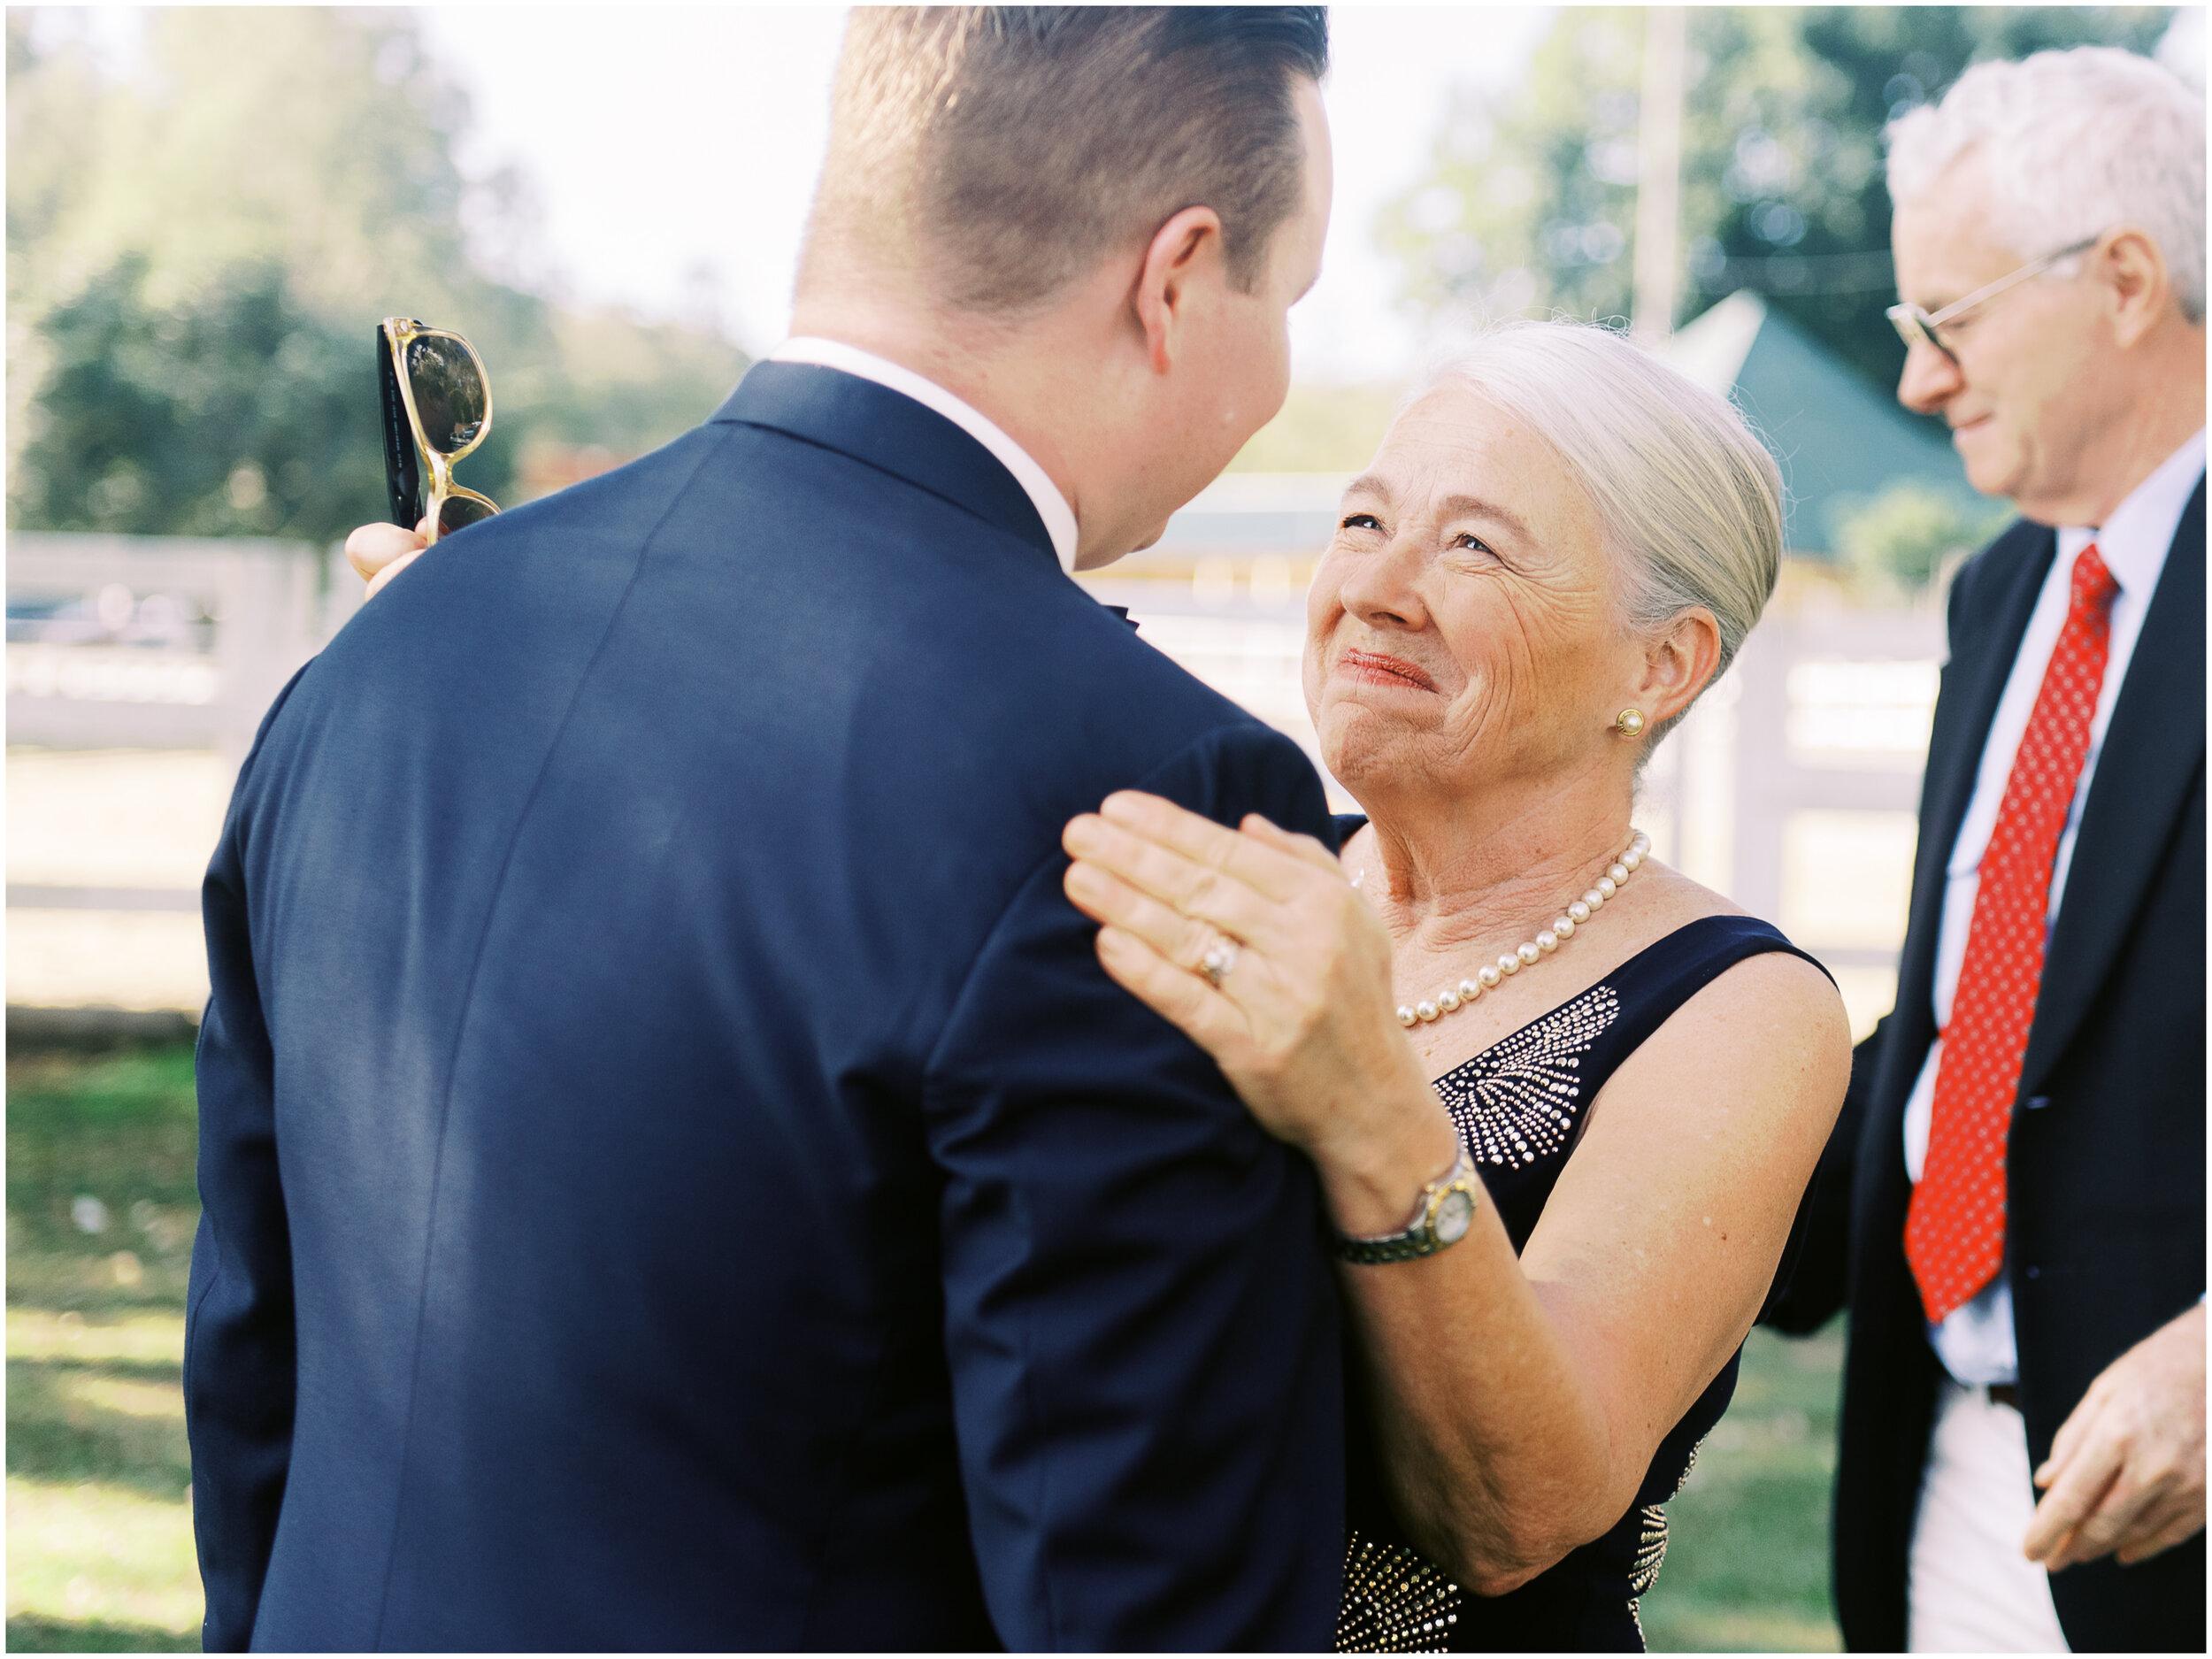 brisbane-film-wedding-photographer-lauren-olivia-luxury-wedding-australia-01-10.jpg